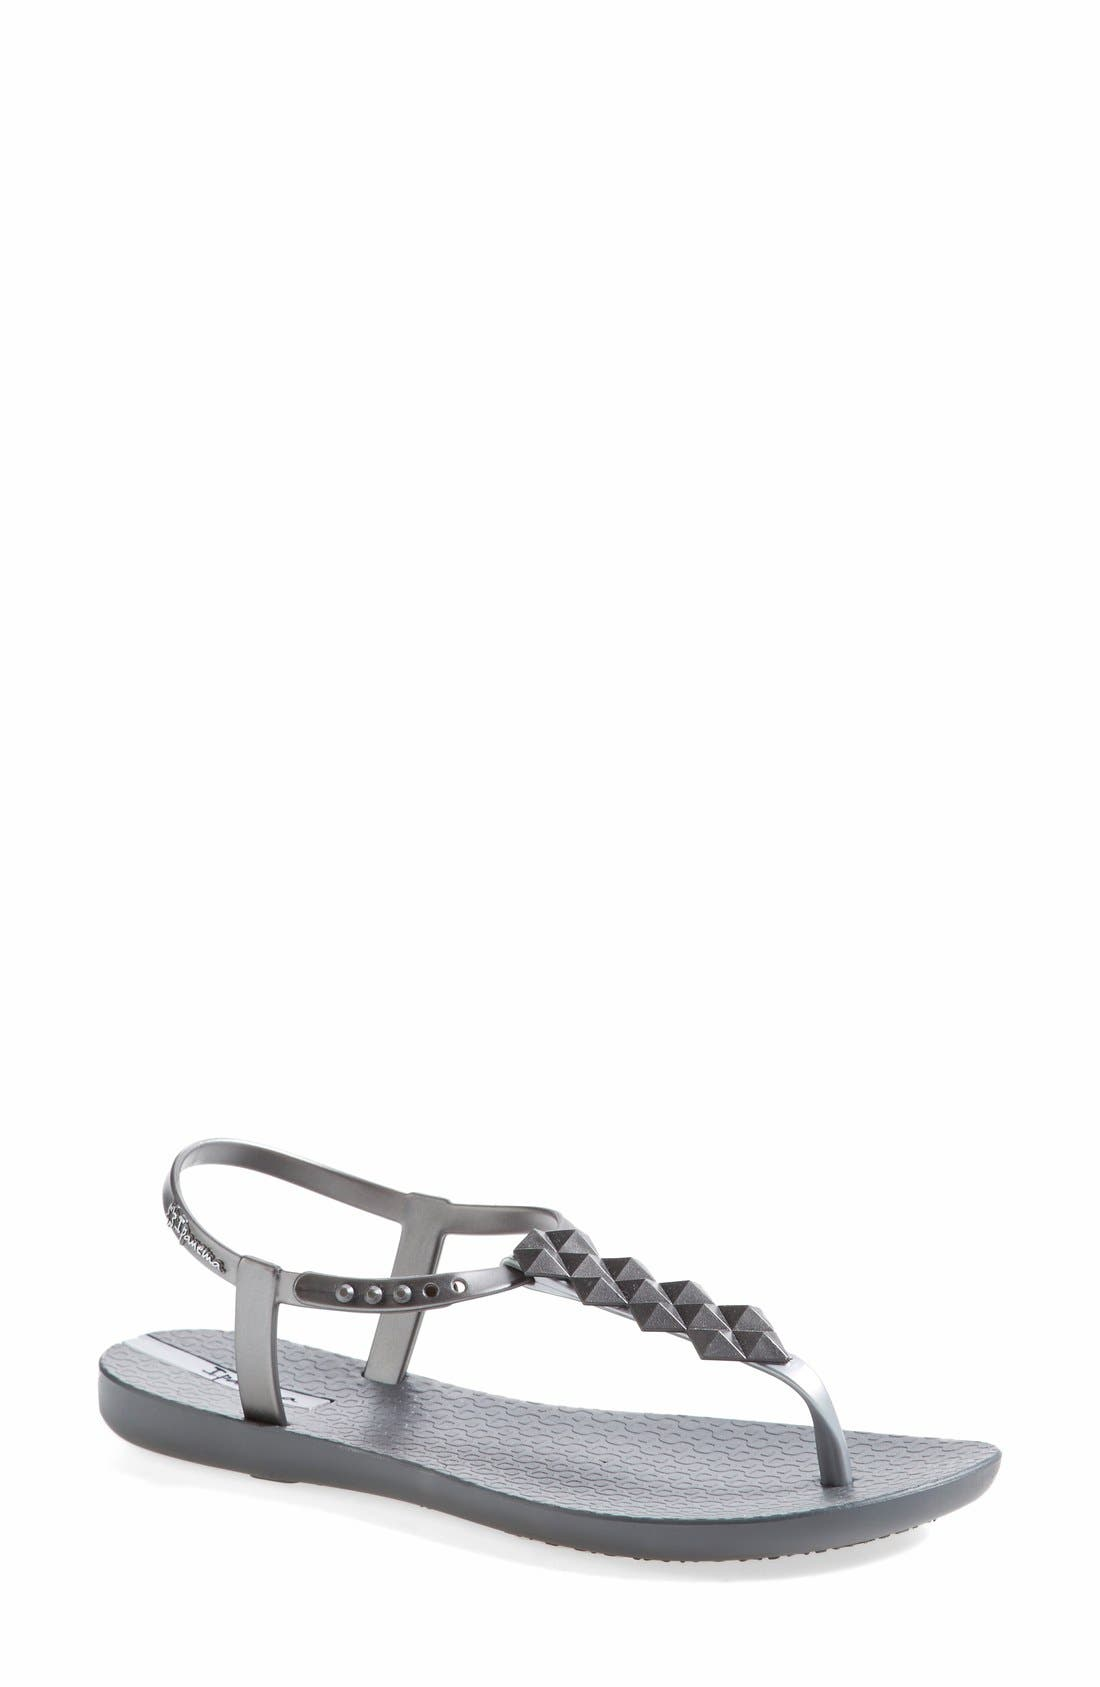 Alternate Image 1 Selected - Ipanema 'Cleo' Pyramid Stud Ankle Strap Flip Flop